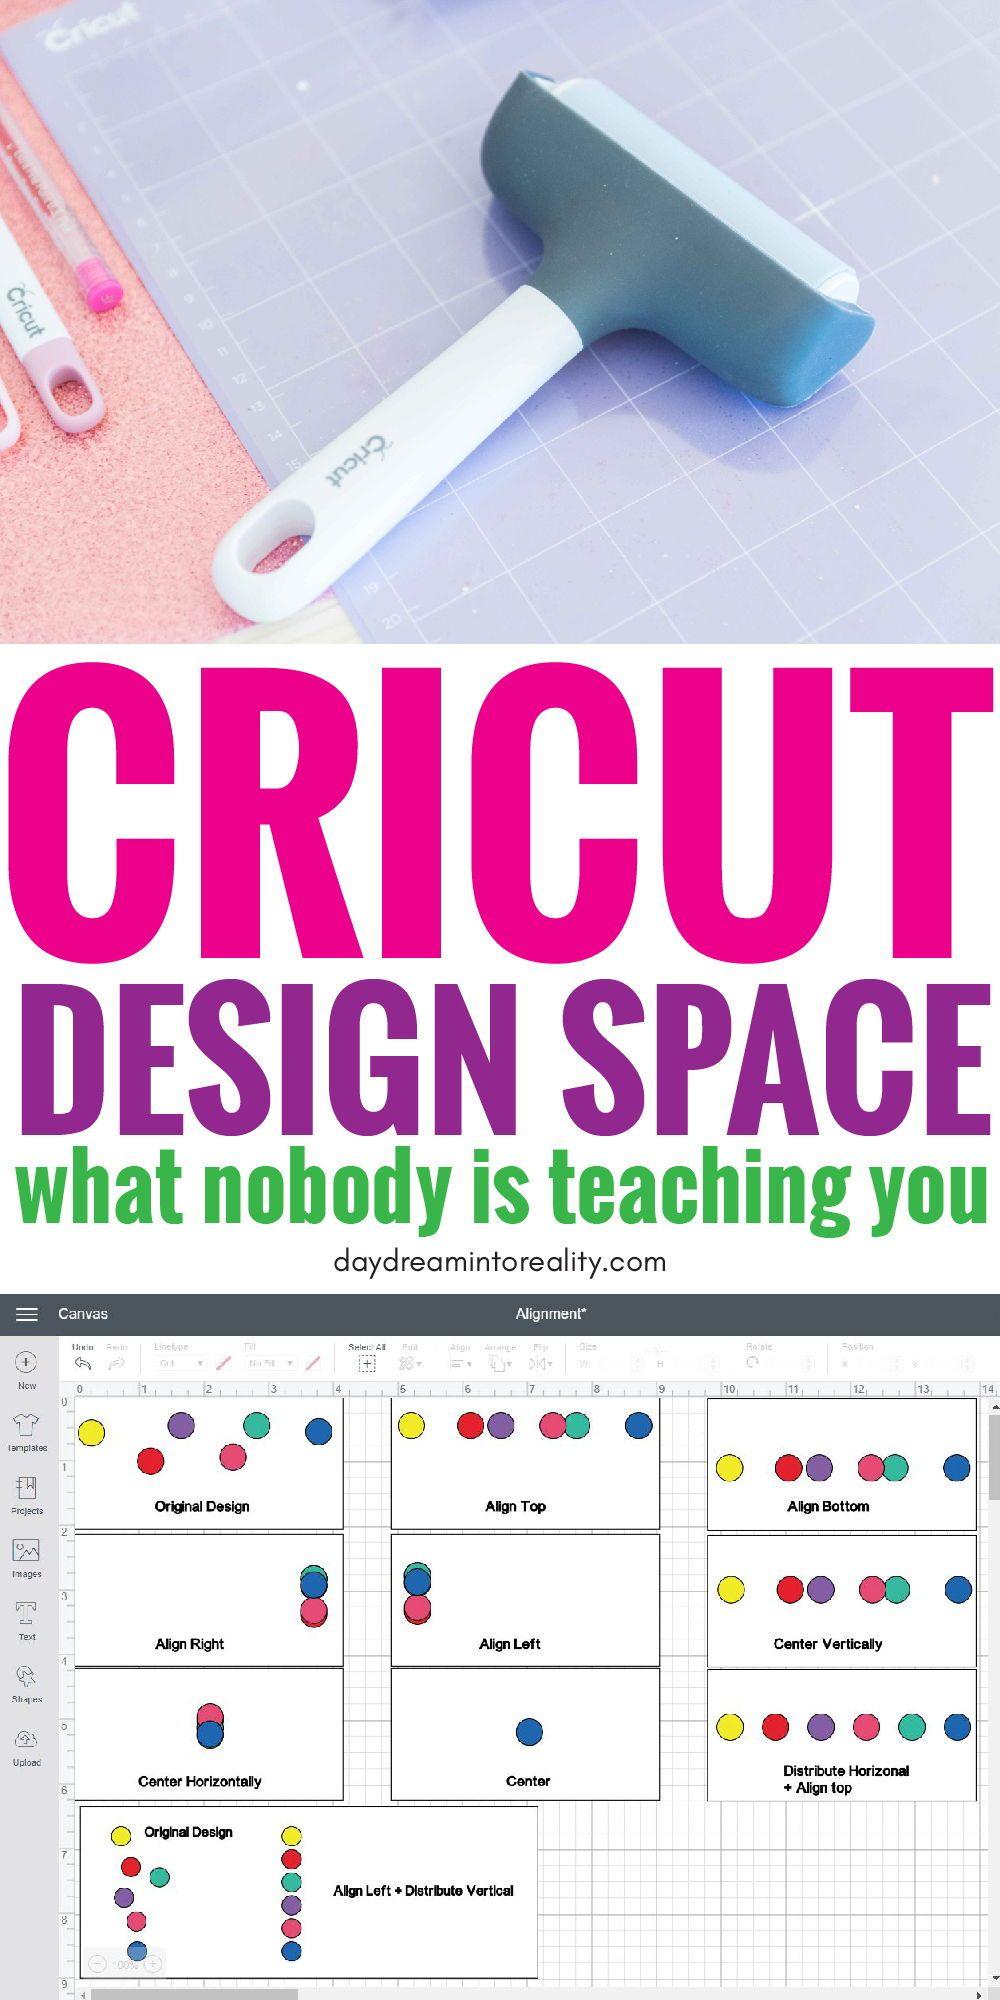 45+ Cricut design space not working 2021 ideas